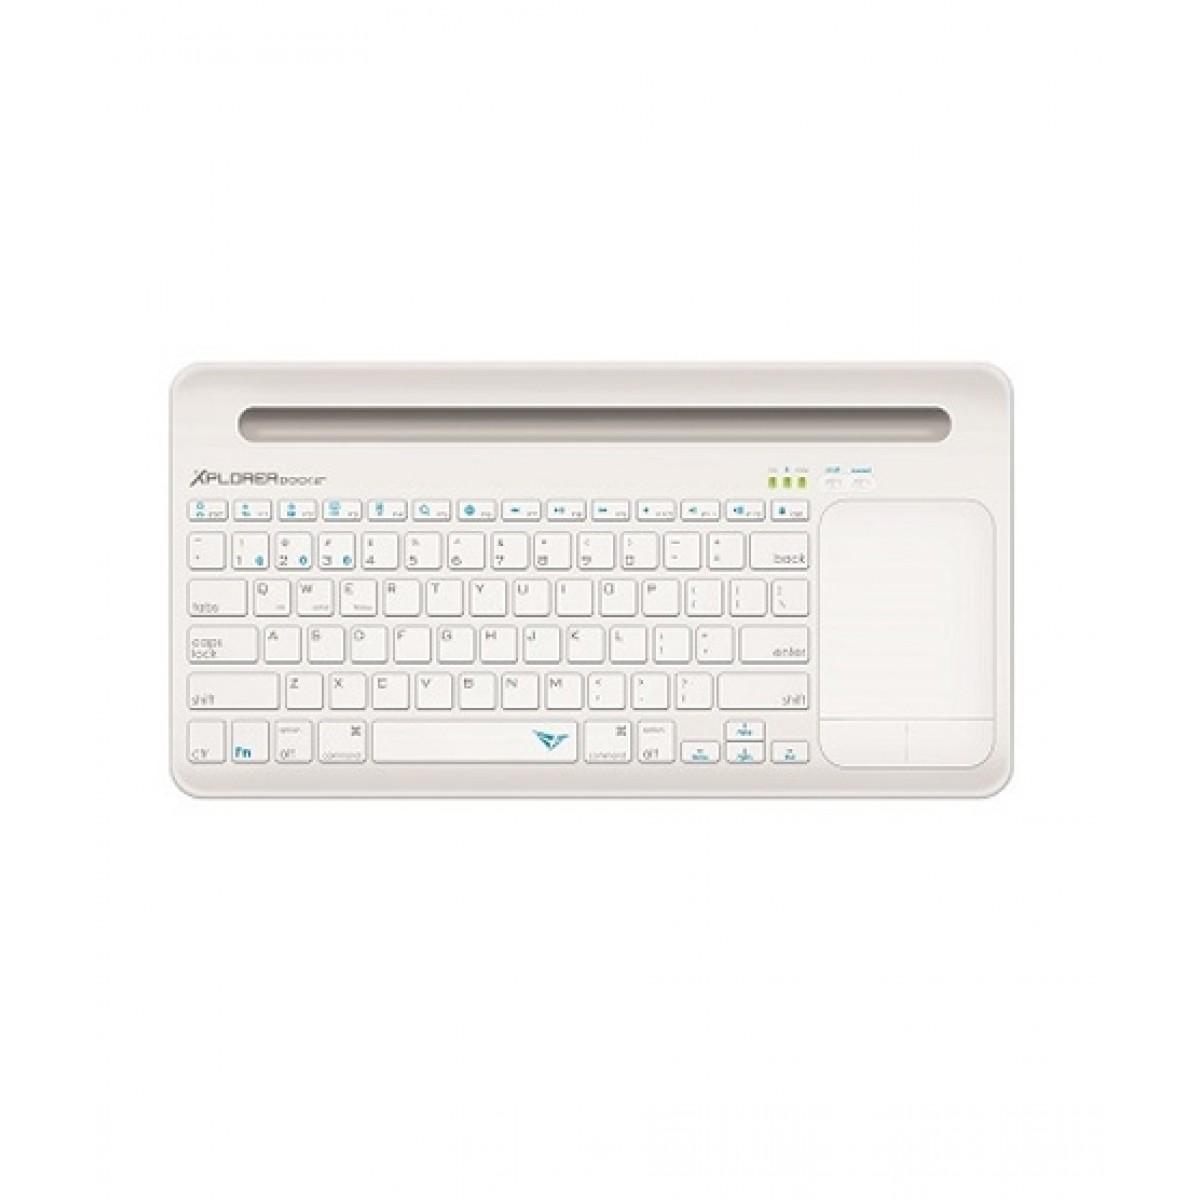 Alcatroz Xplorer Dock 2 Bluetooth Keyboard White/Light Grey